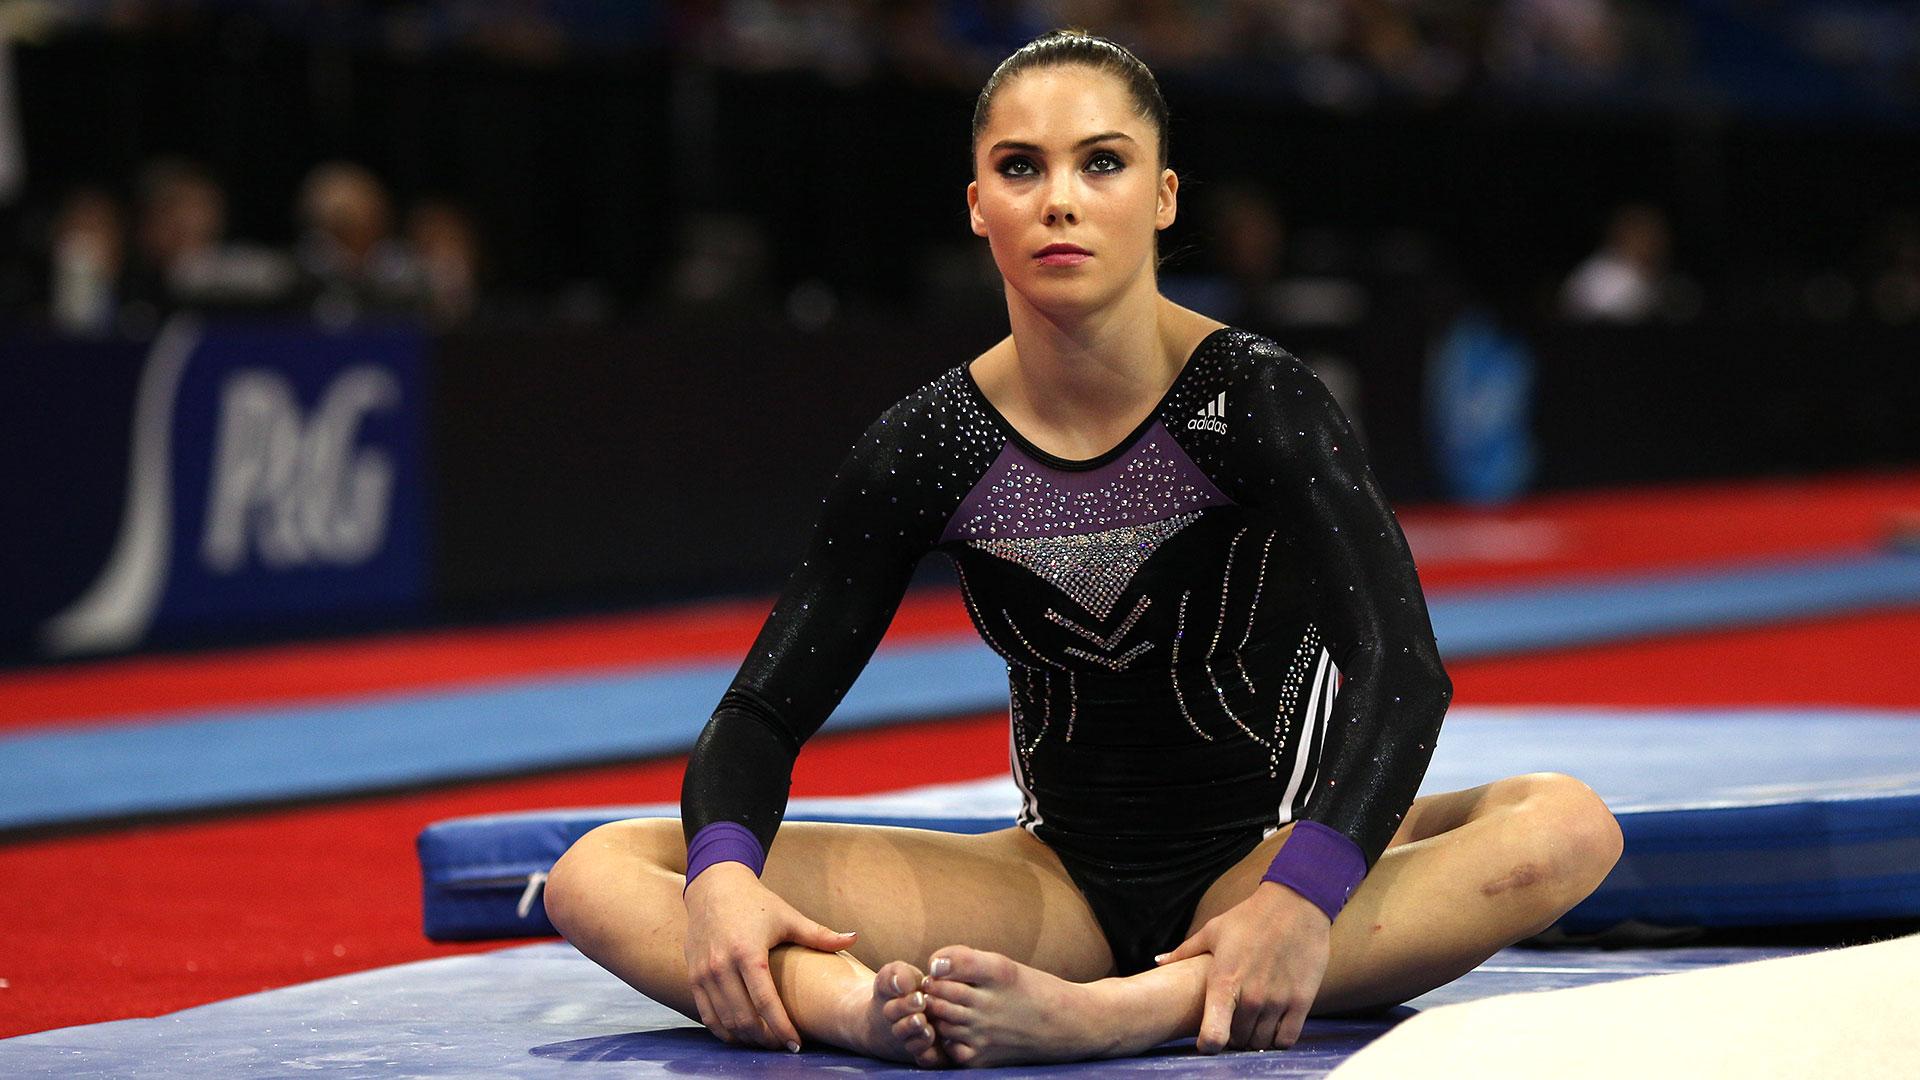 McKayla Maroney (Getty Images)